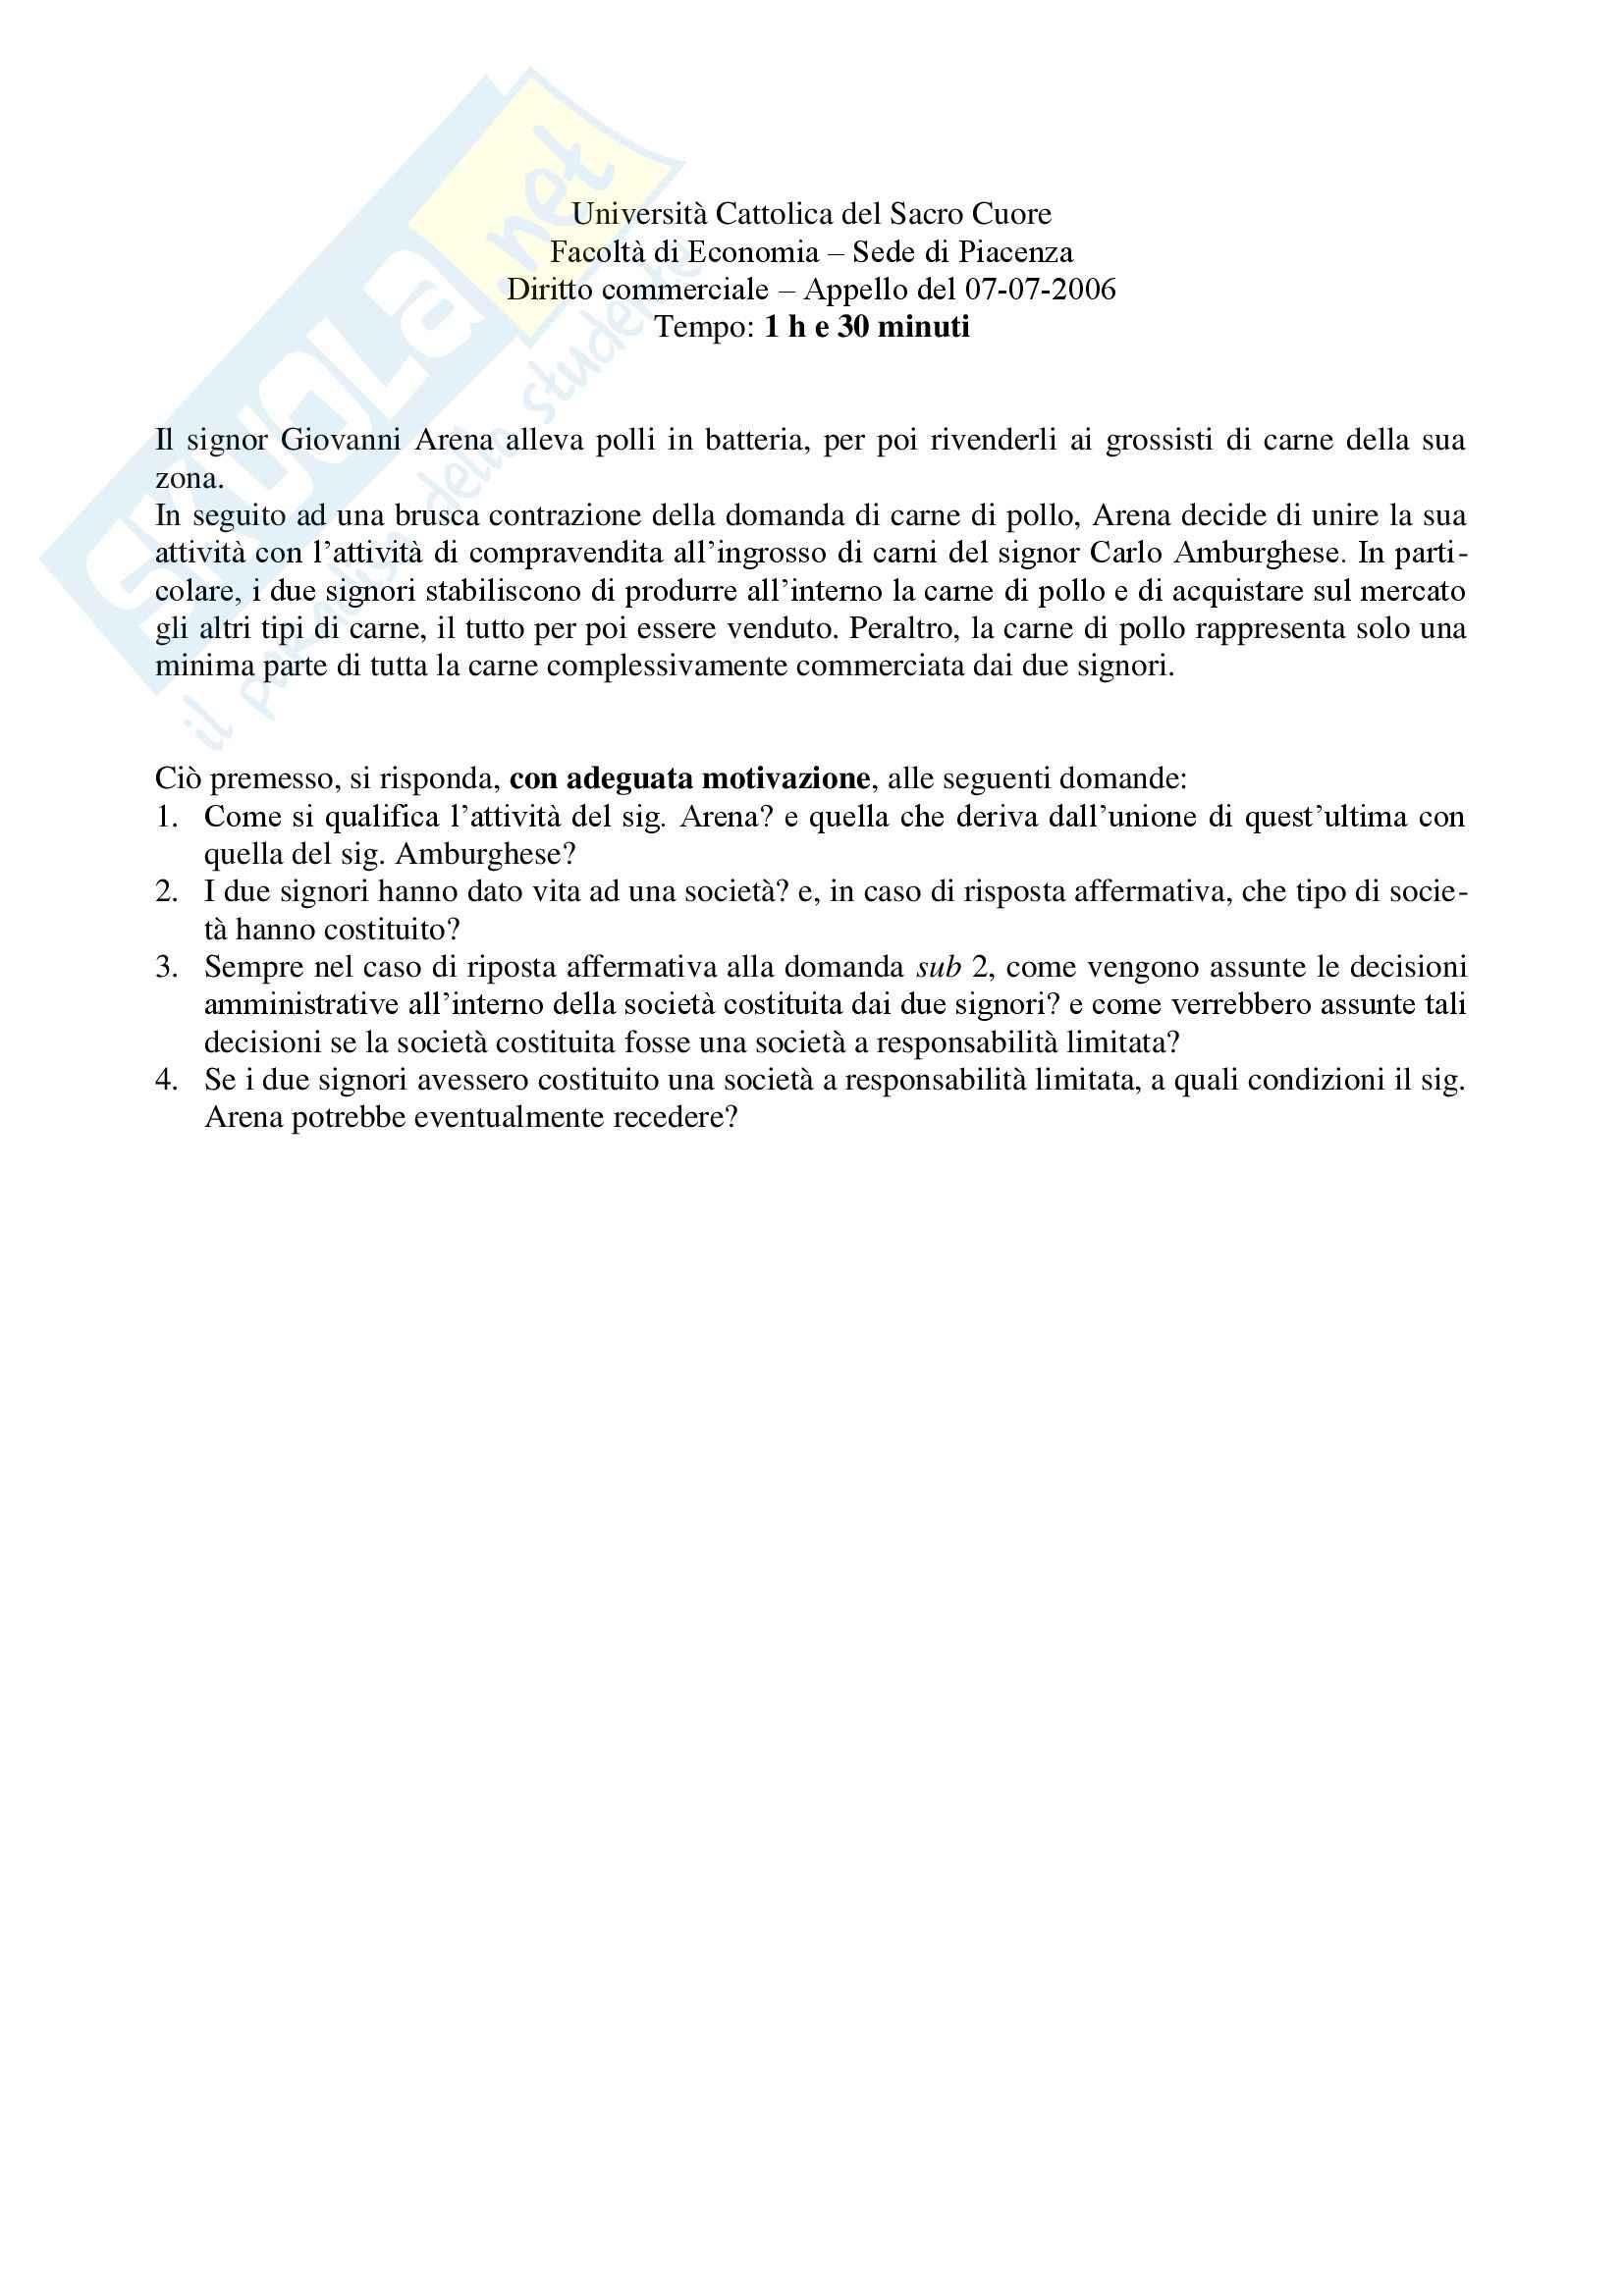 Diritto commerciale - Tema d'esame